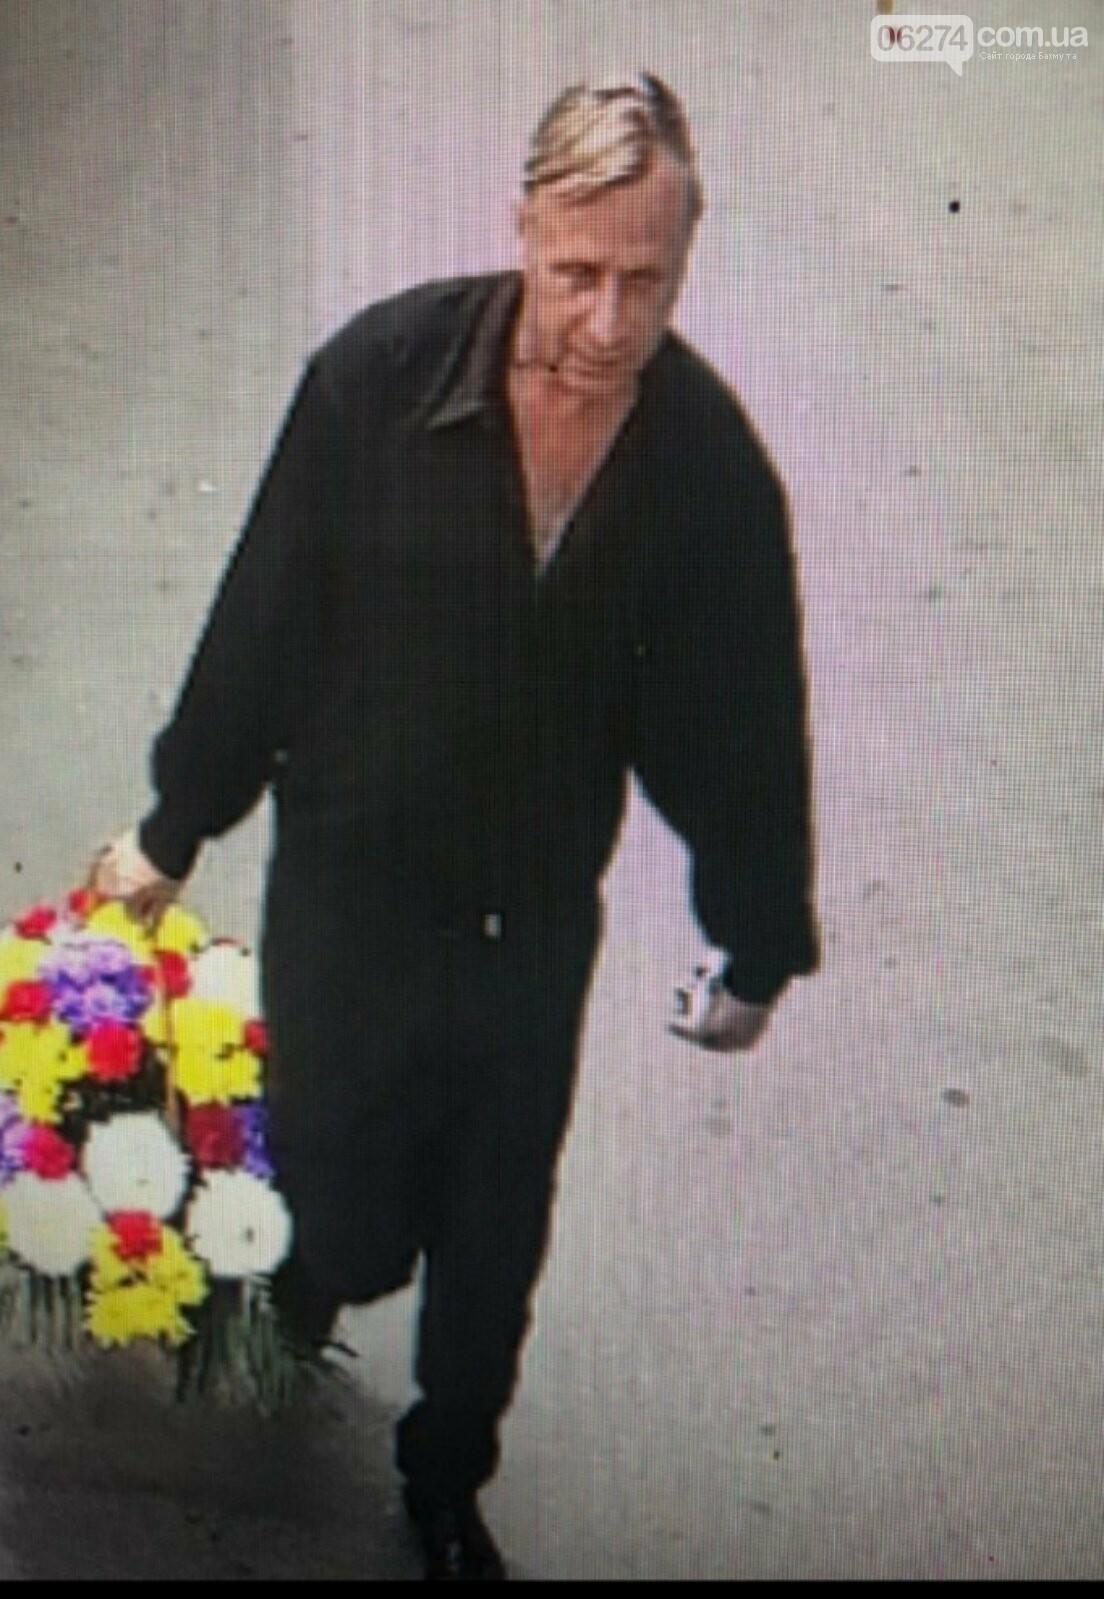 В Бахмуте ищут мужчину, который украл букет цветов с «Обелиска славы» (ФОТО), фото-4